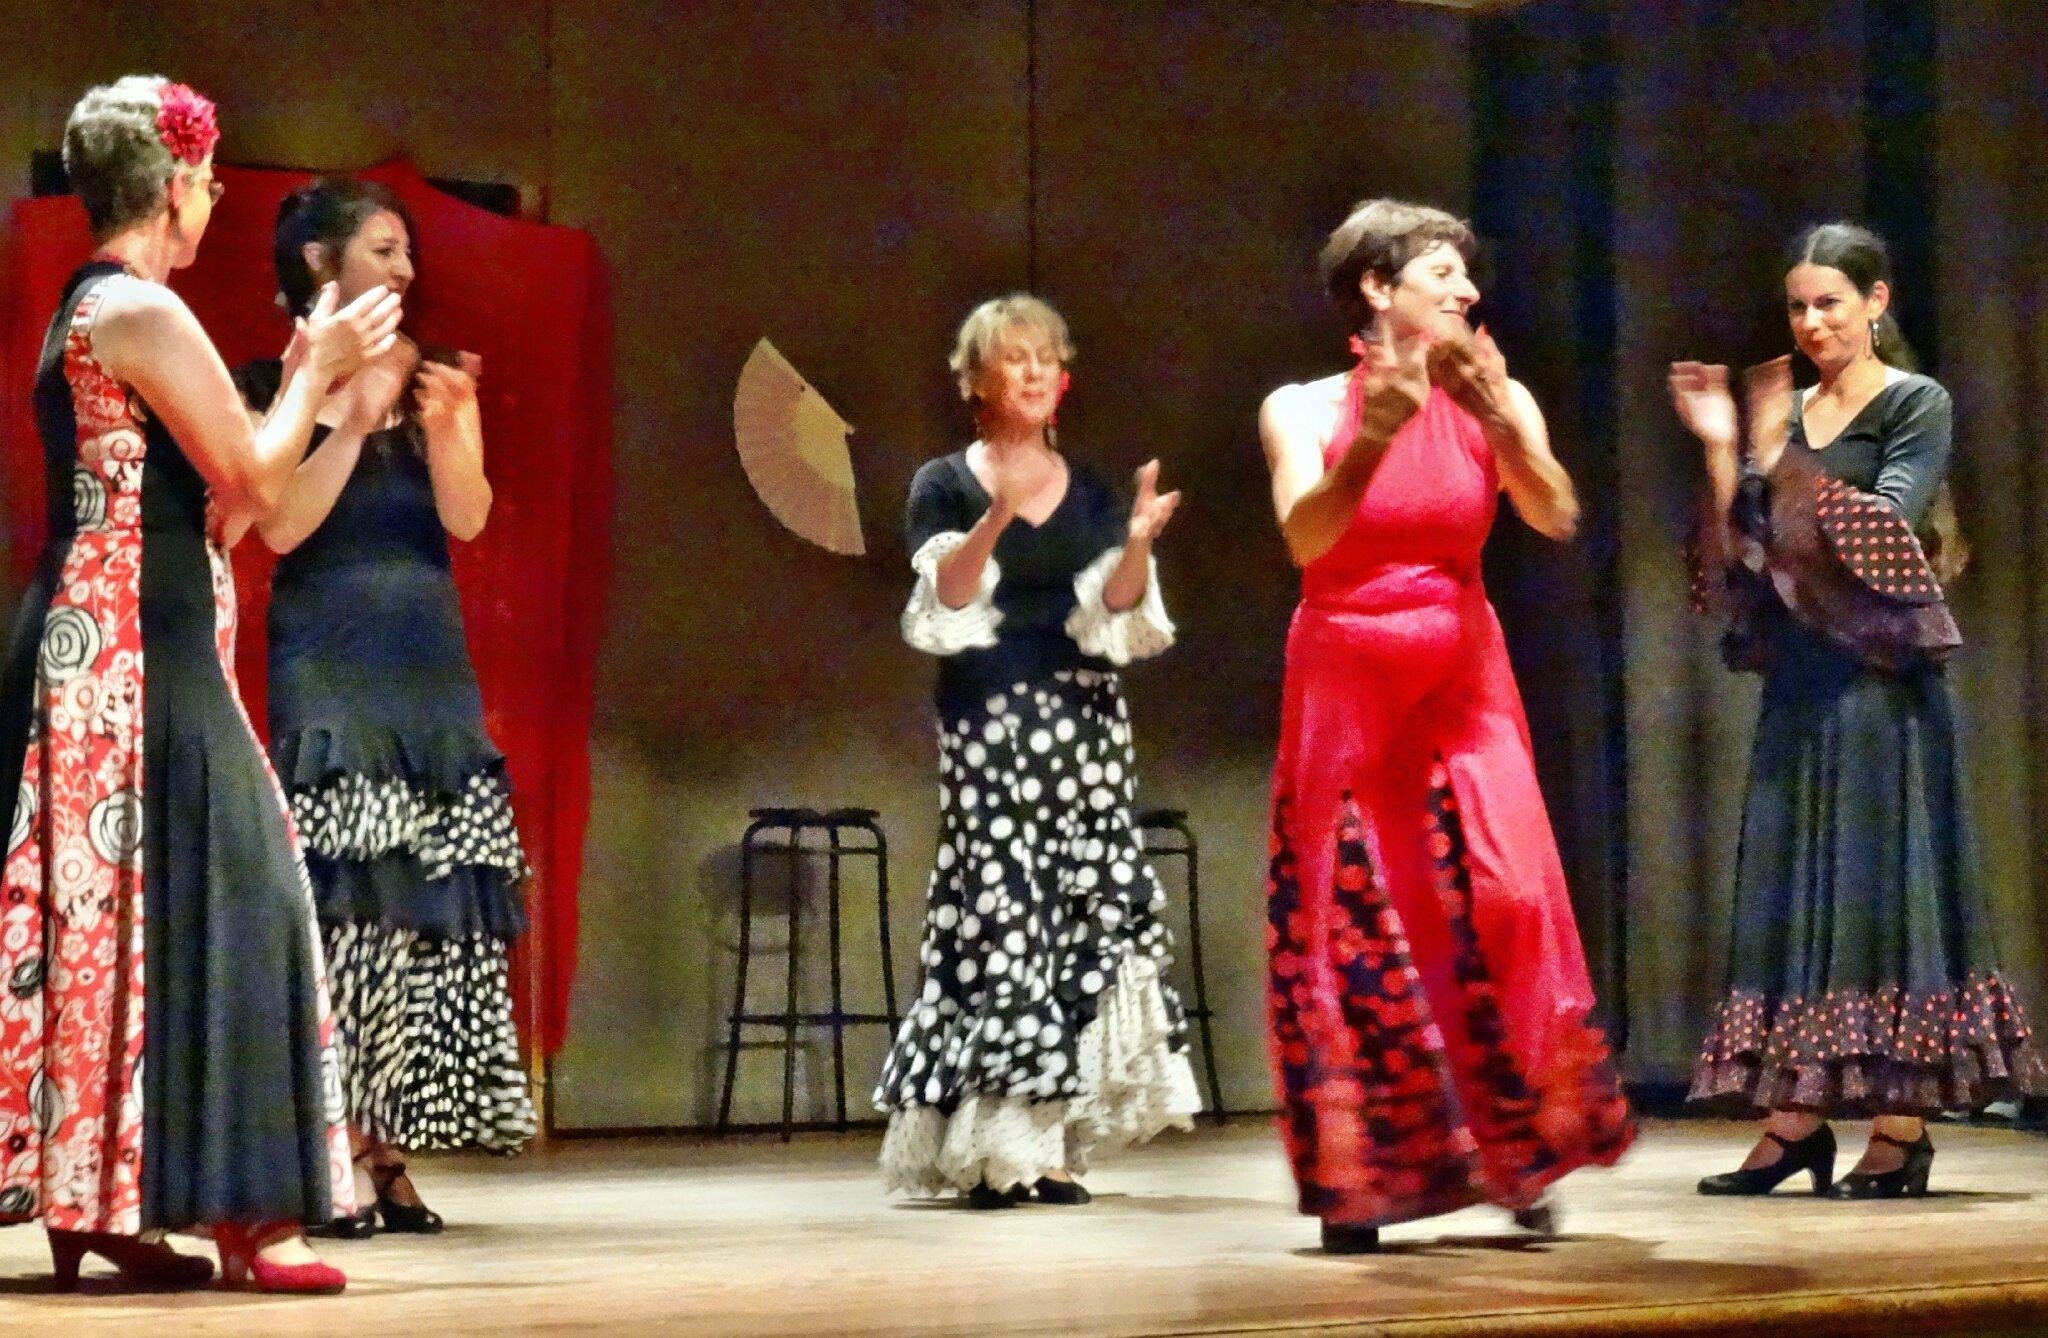 Gala SIN EMBARGO 28 juin 2015 Sainte-Croix-du-Mont (54)